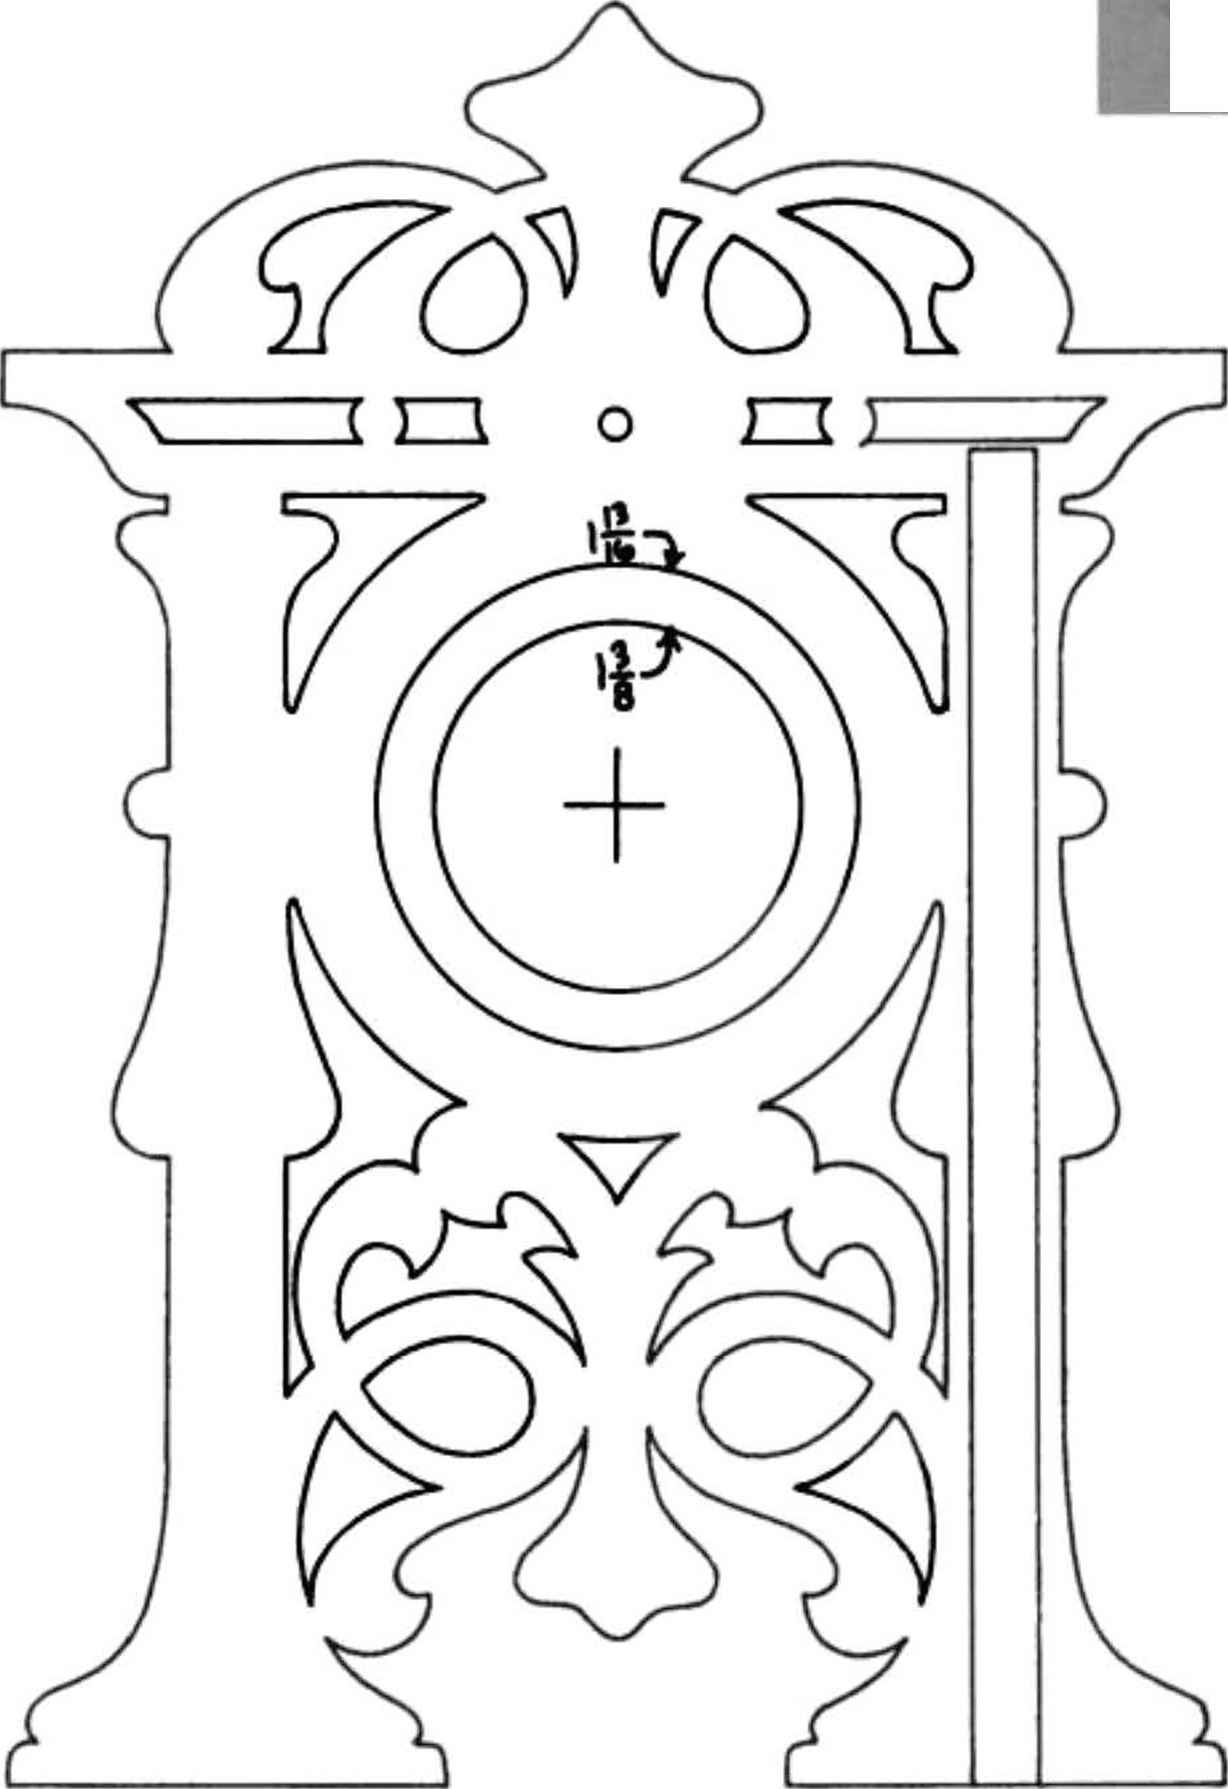 Clocks - Scroll saw - Woodworking Archive